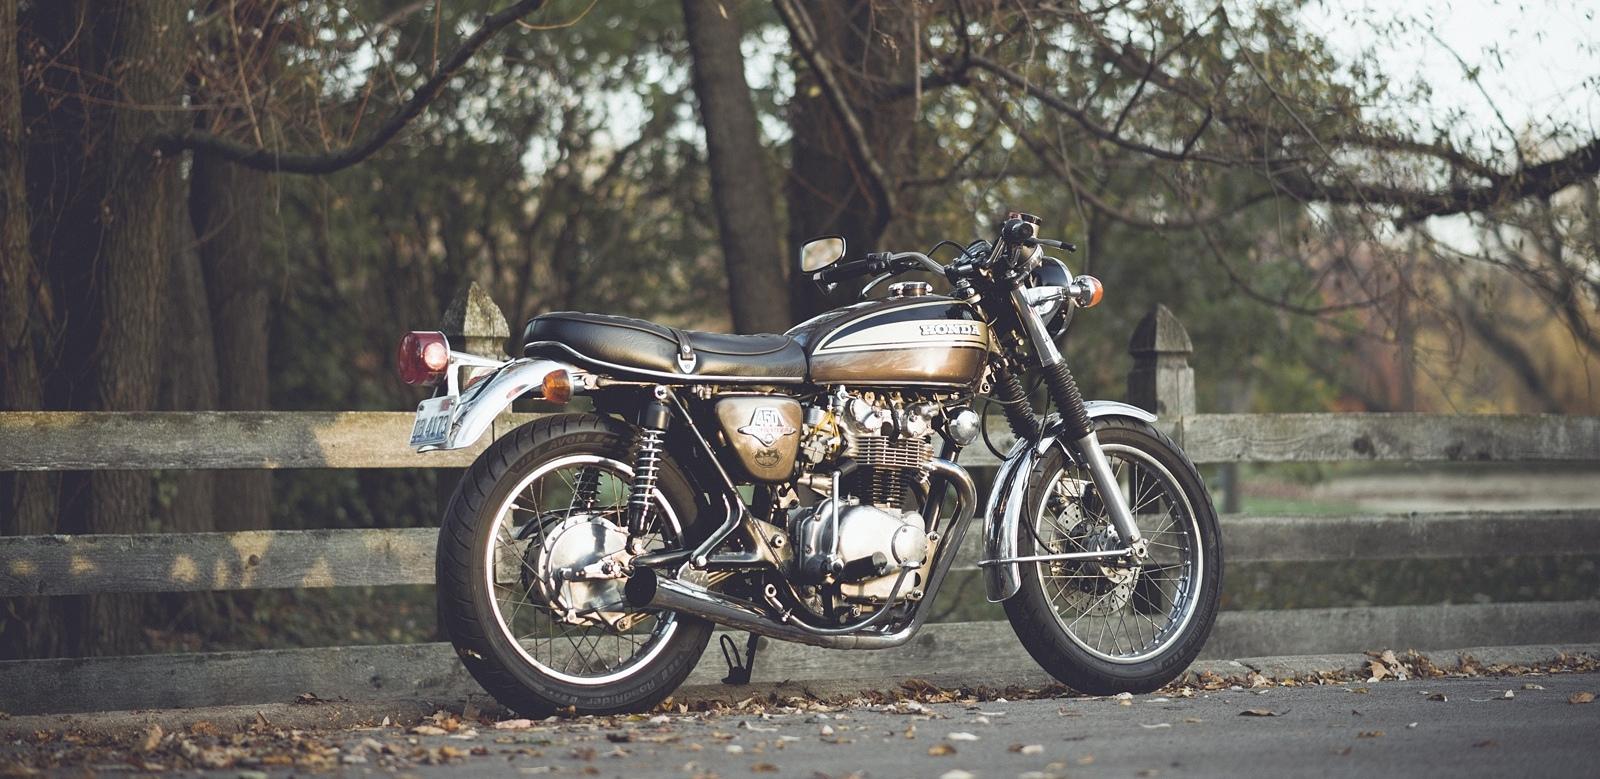 My 1974 Honda CB450 Supersport